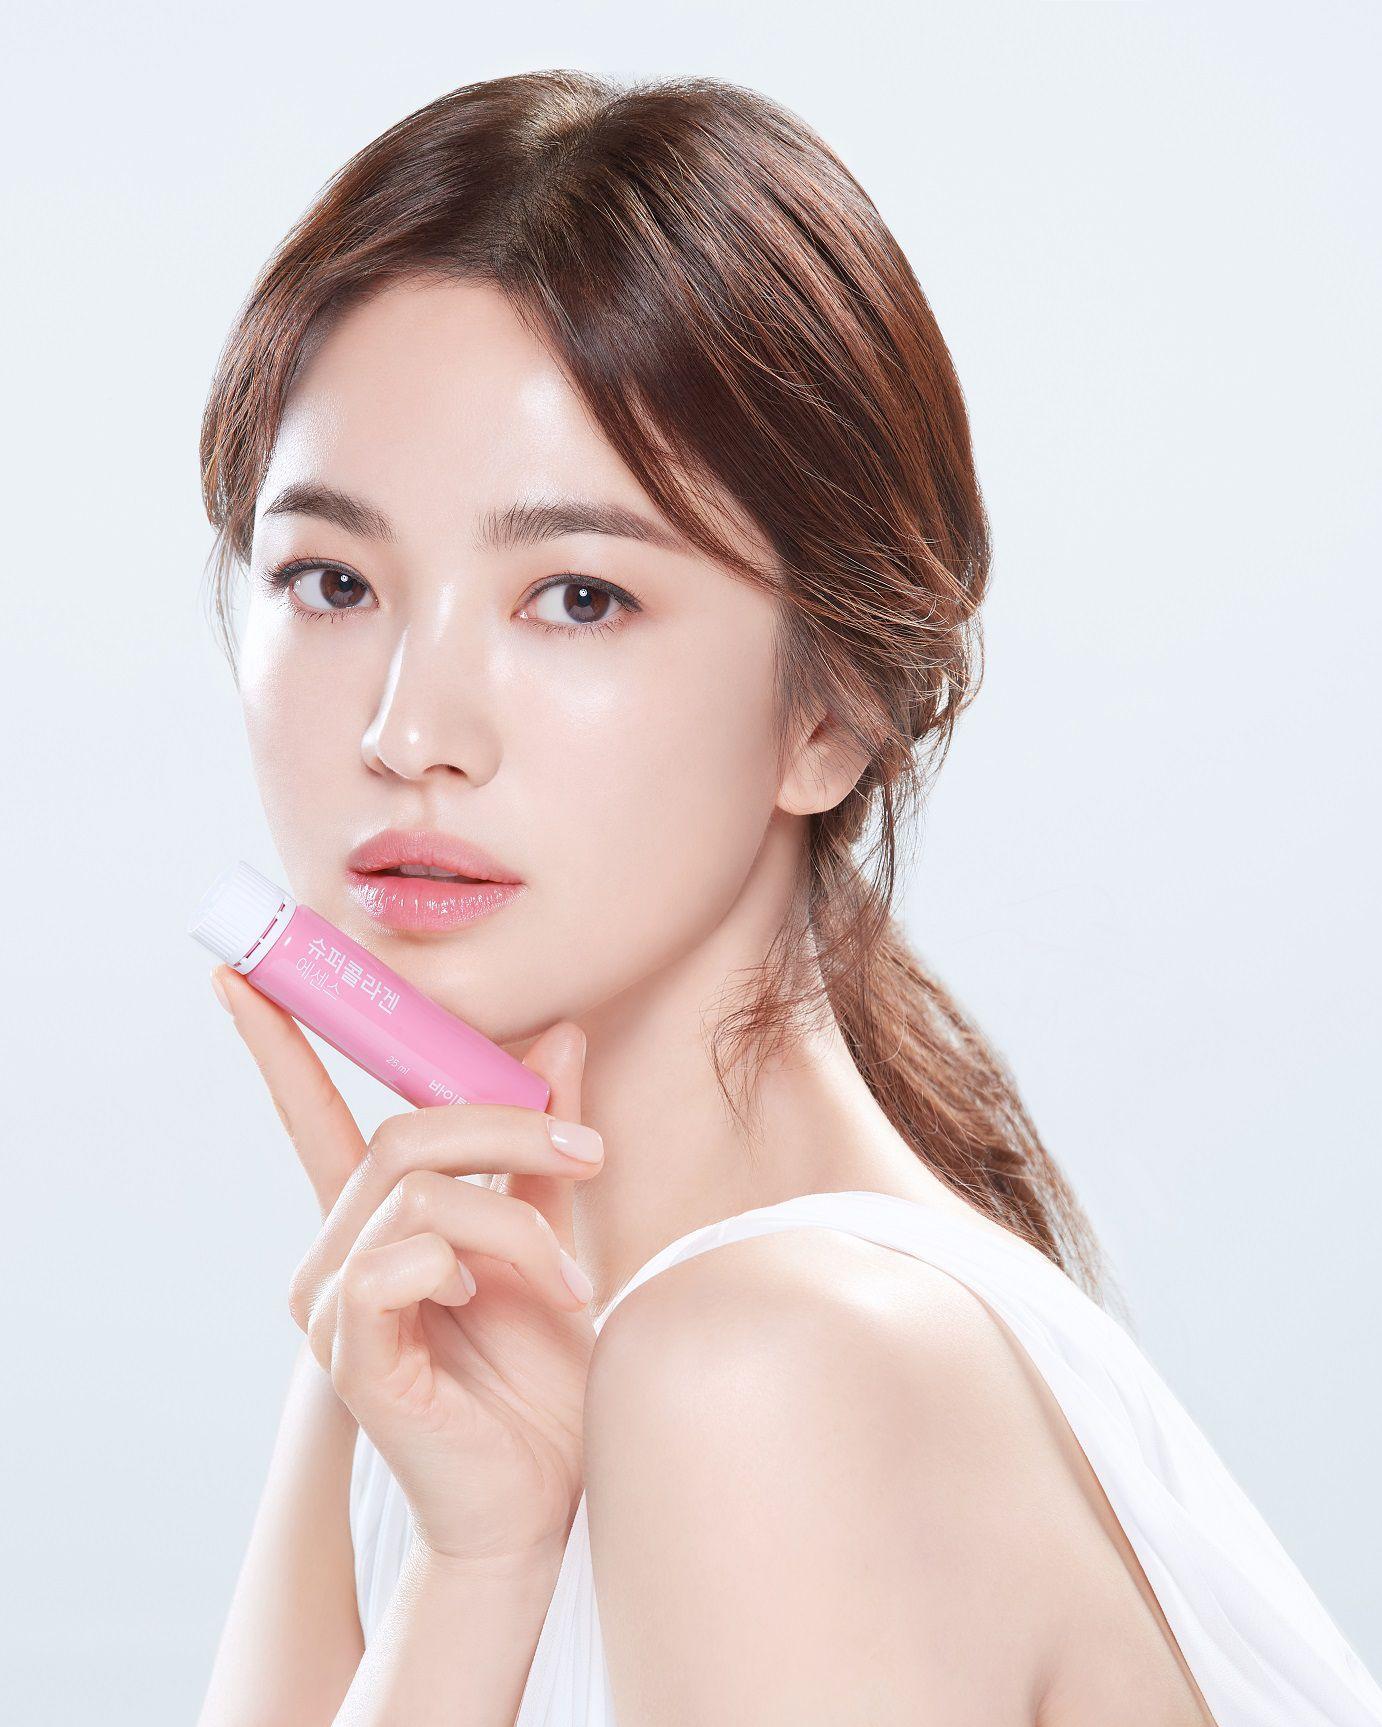 Song Hye Kyo - Vita Beauty, Sulwhasoo.